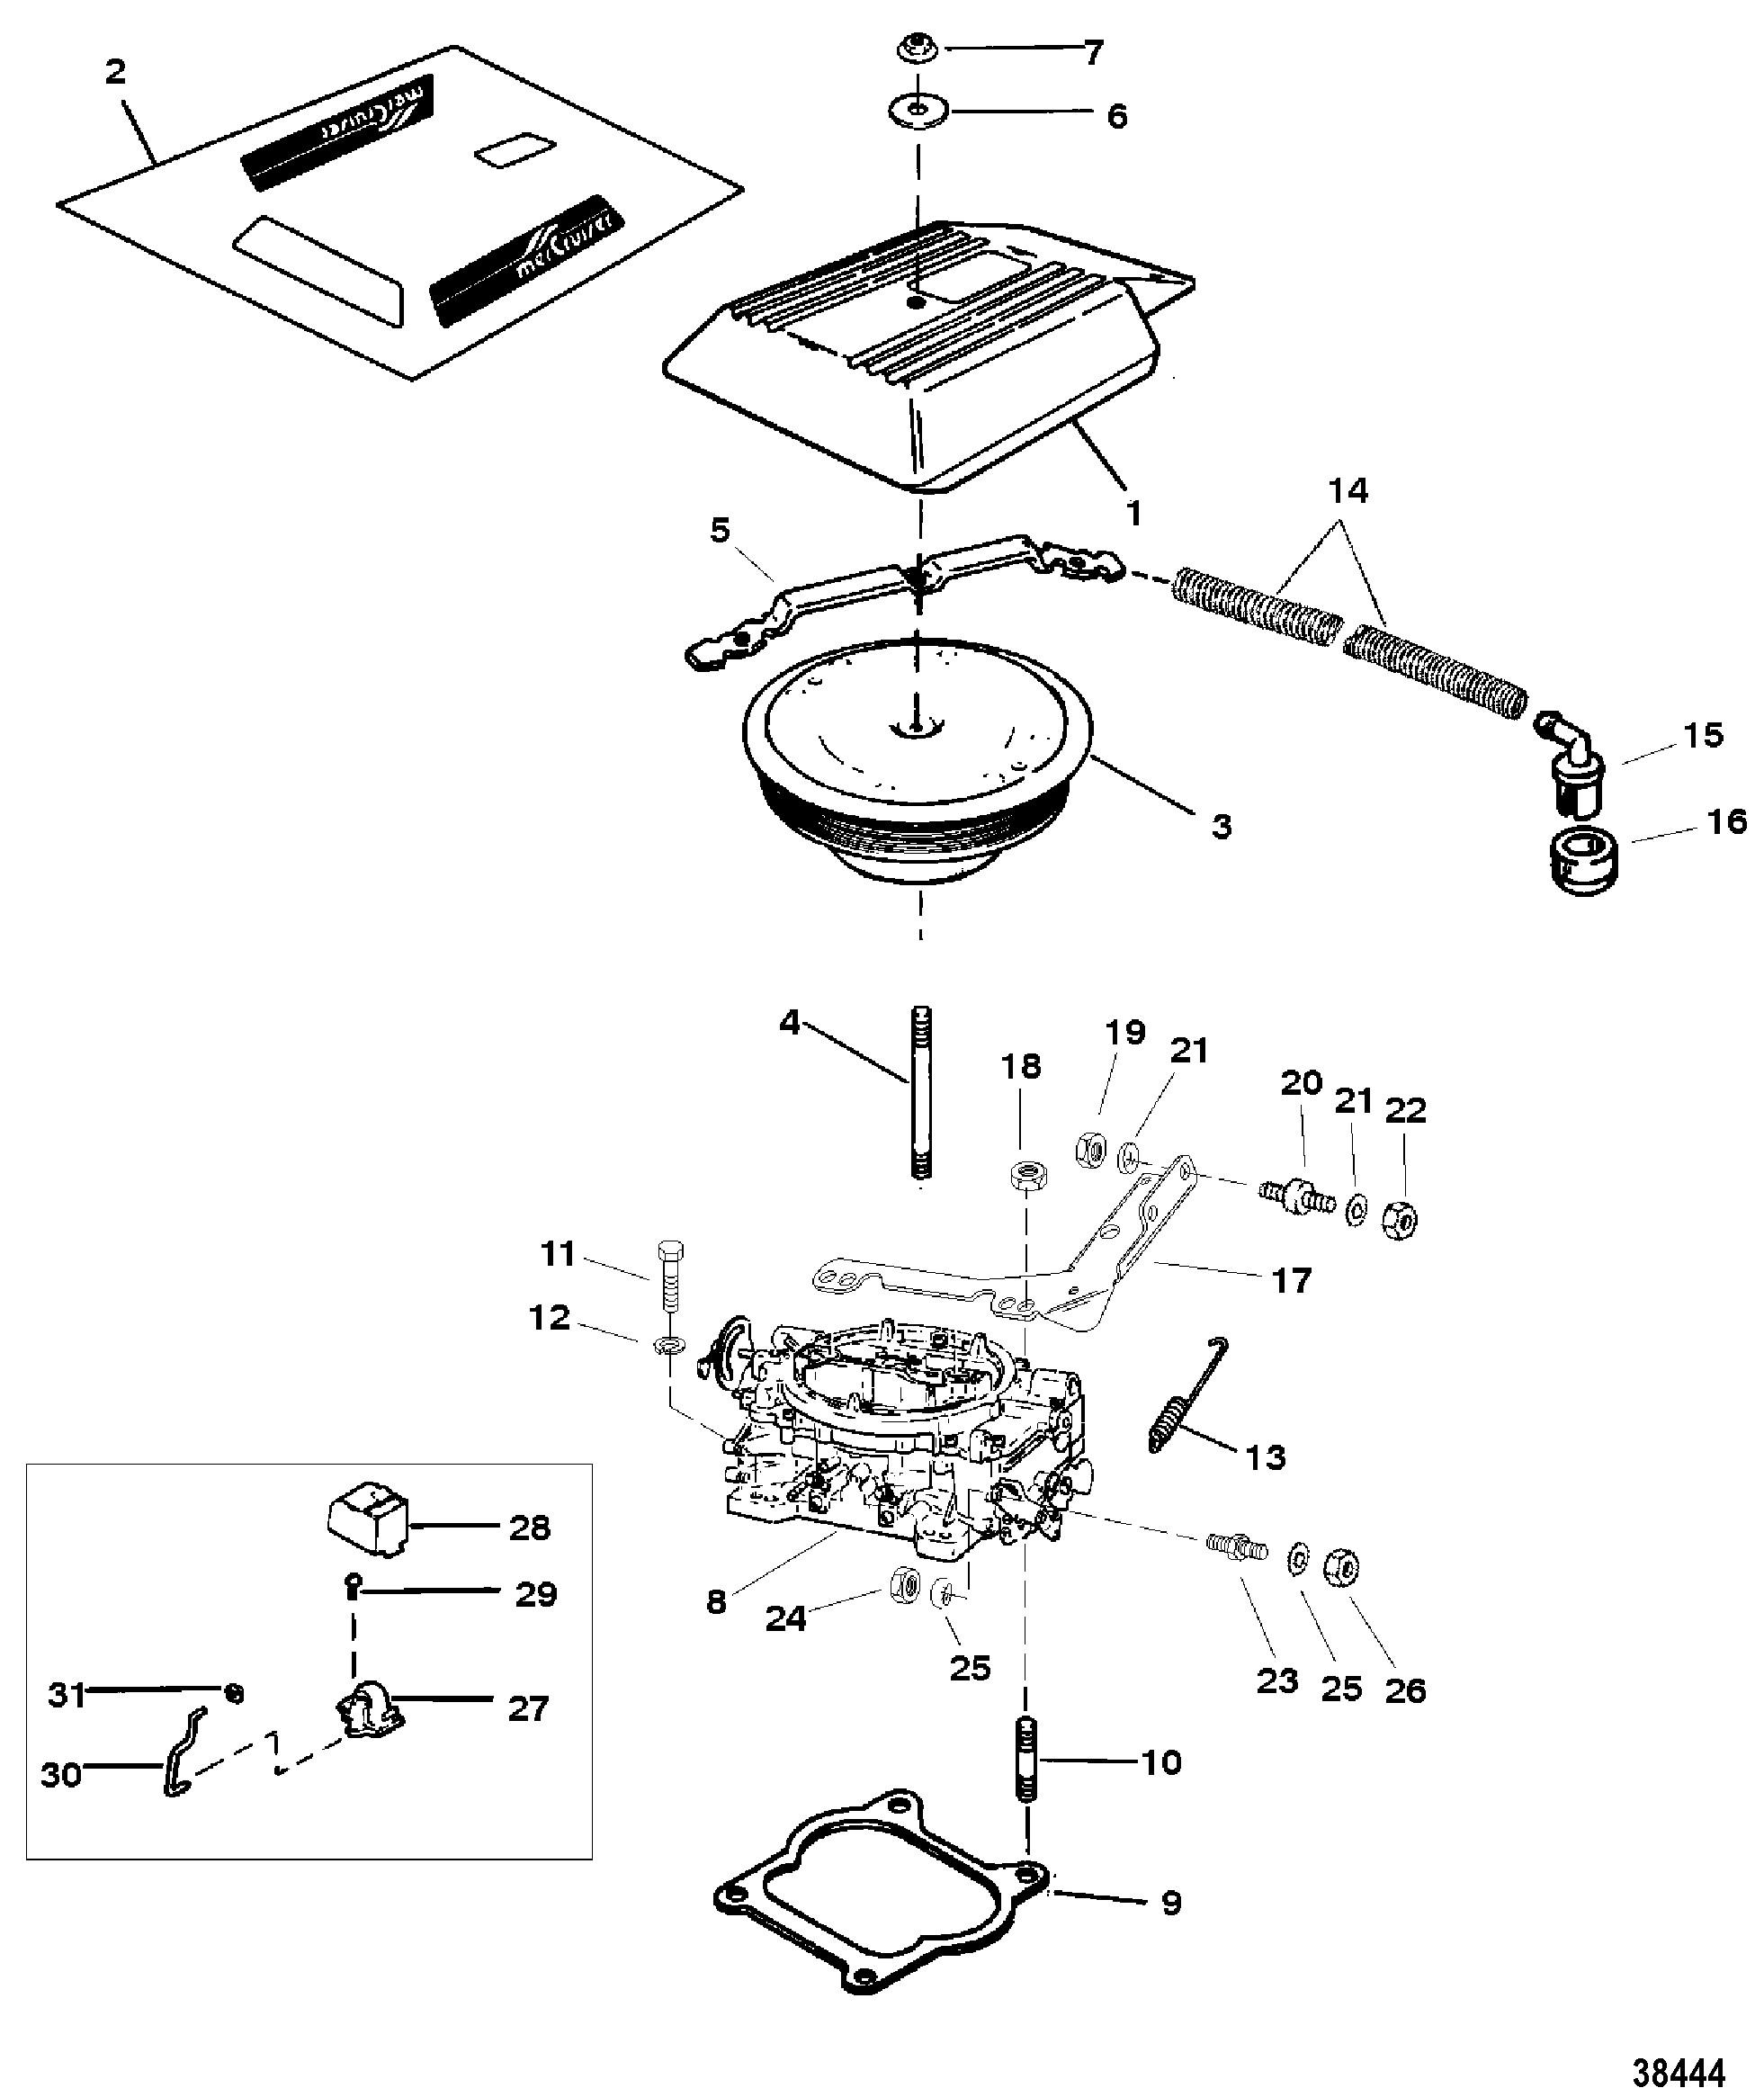 hight resolution of 3 liter mercruiser engine diagram carburetor and throttle linkage 4 barrel for mercruiser 4 3l 4 3lx